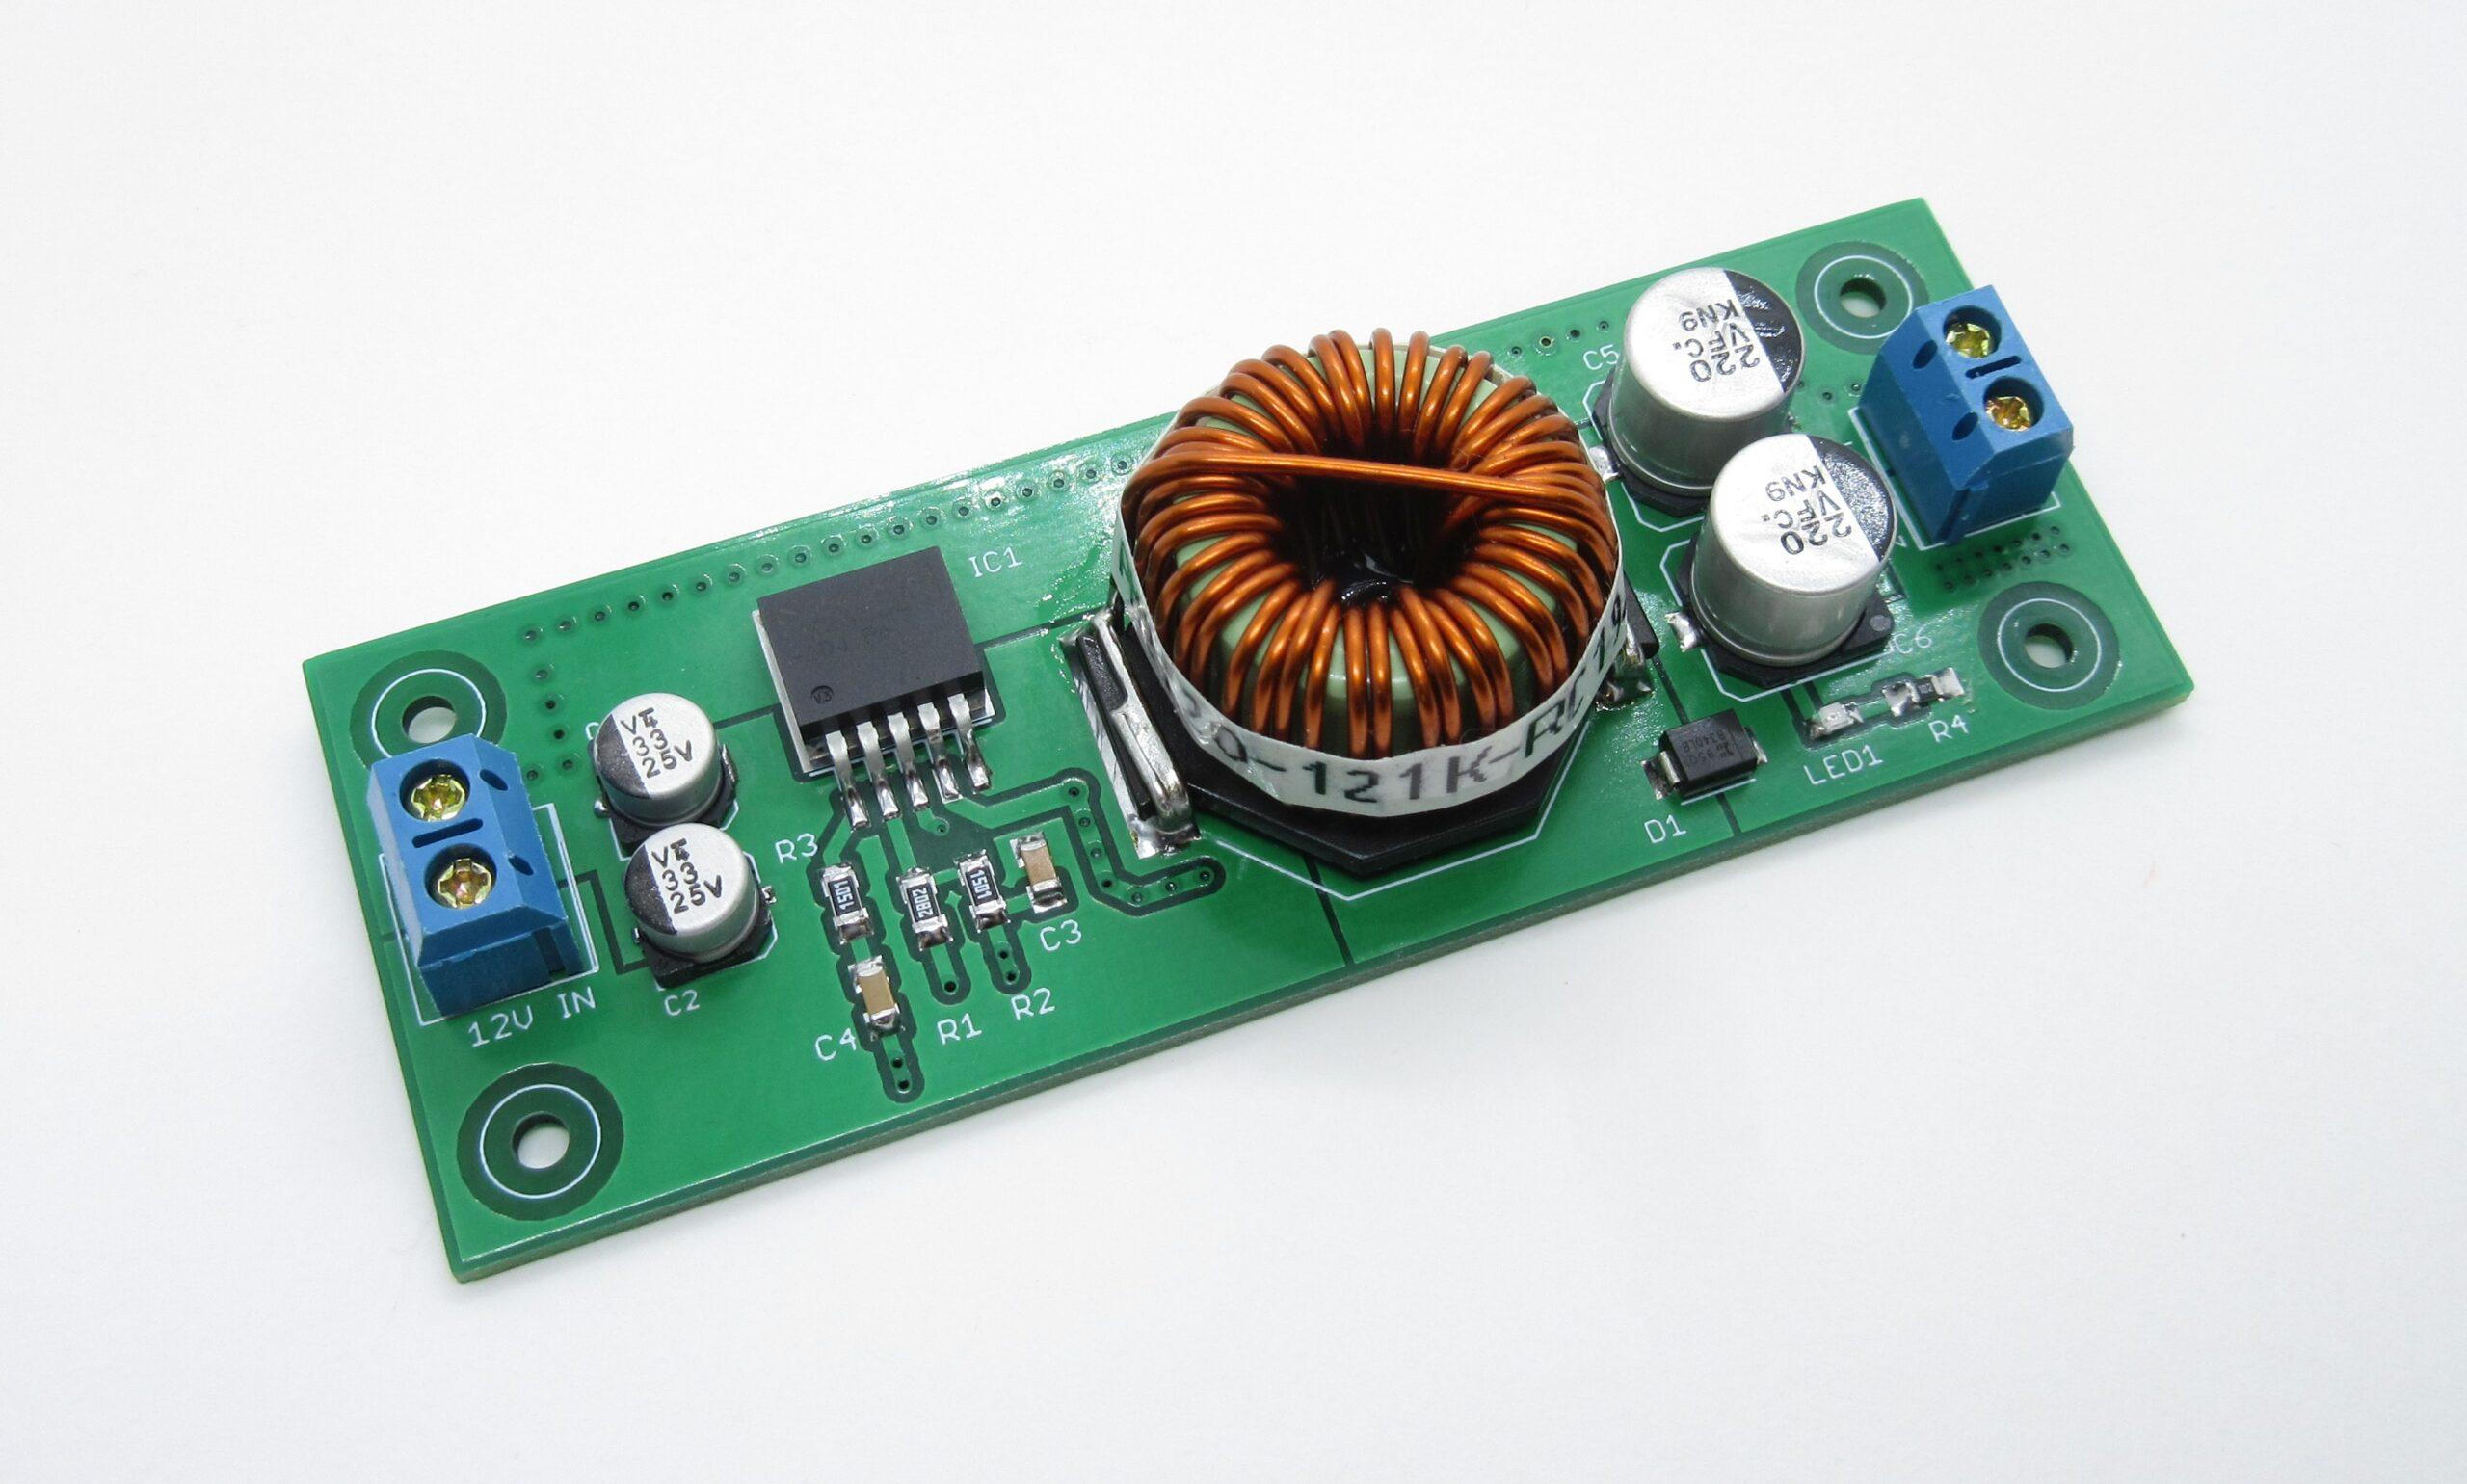 12V to 24V @ 1A Step-up switching regulator using LM2585